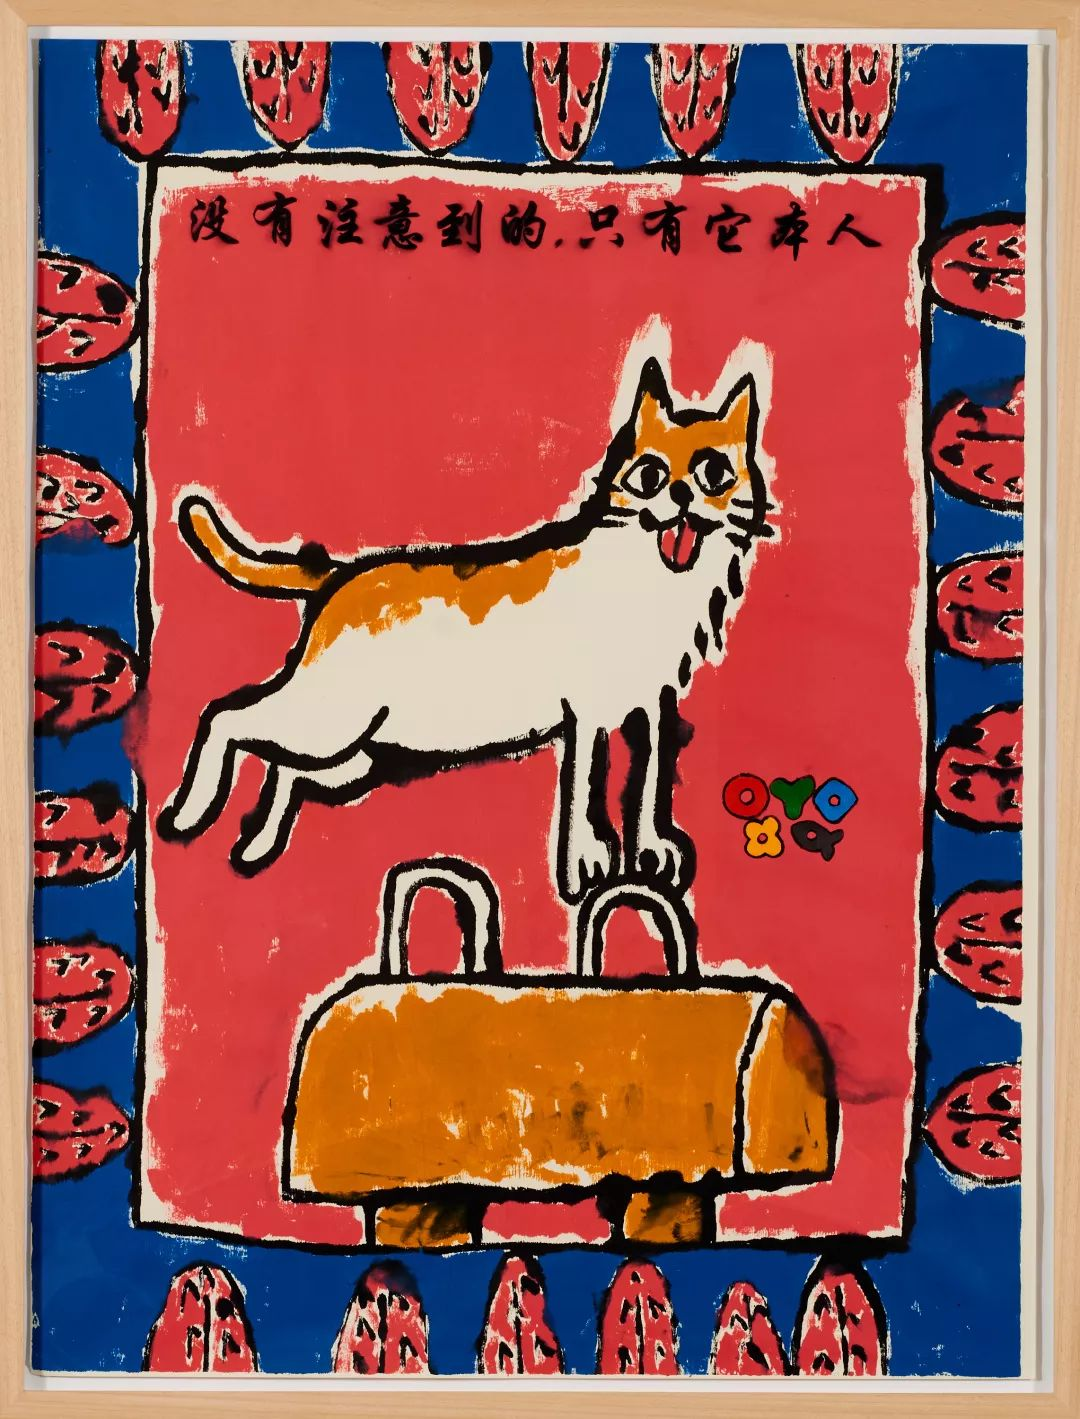 JINGART艺览北京的最后一日观展指南